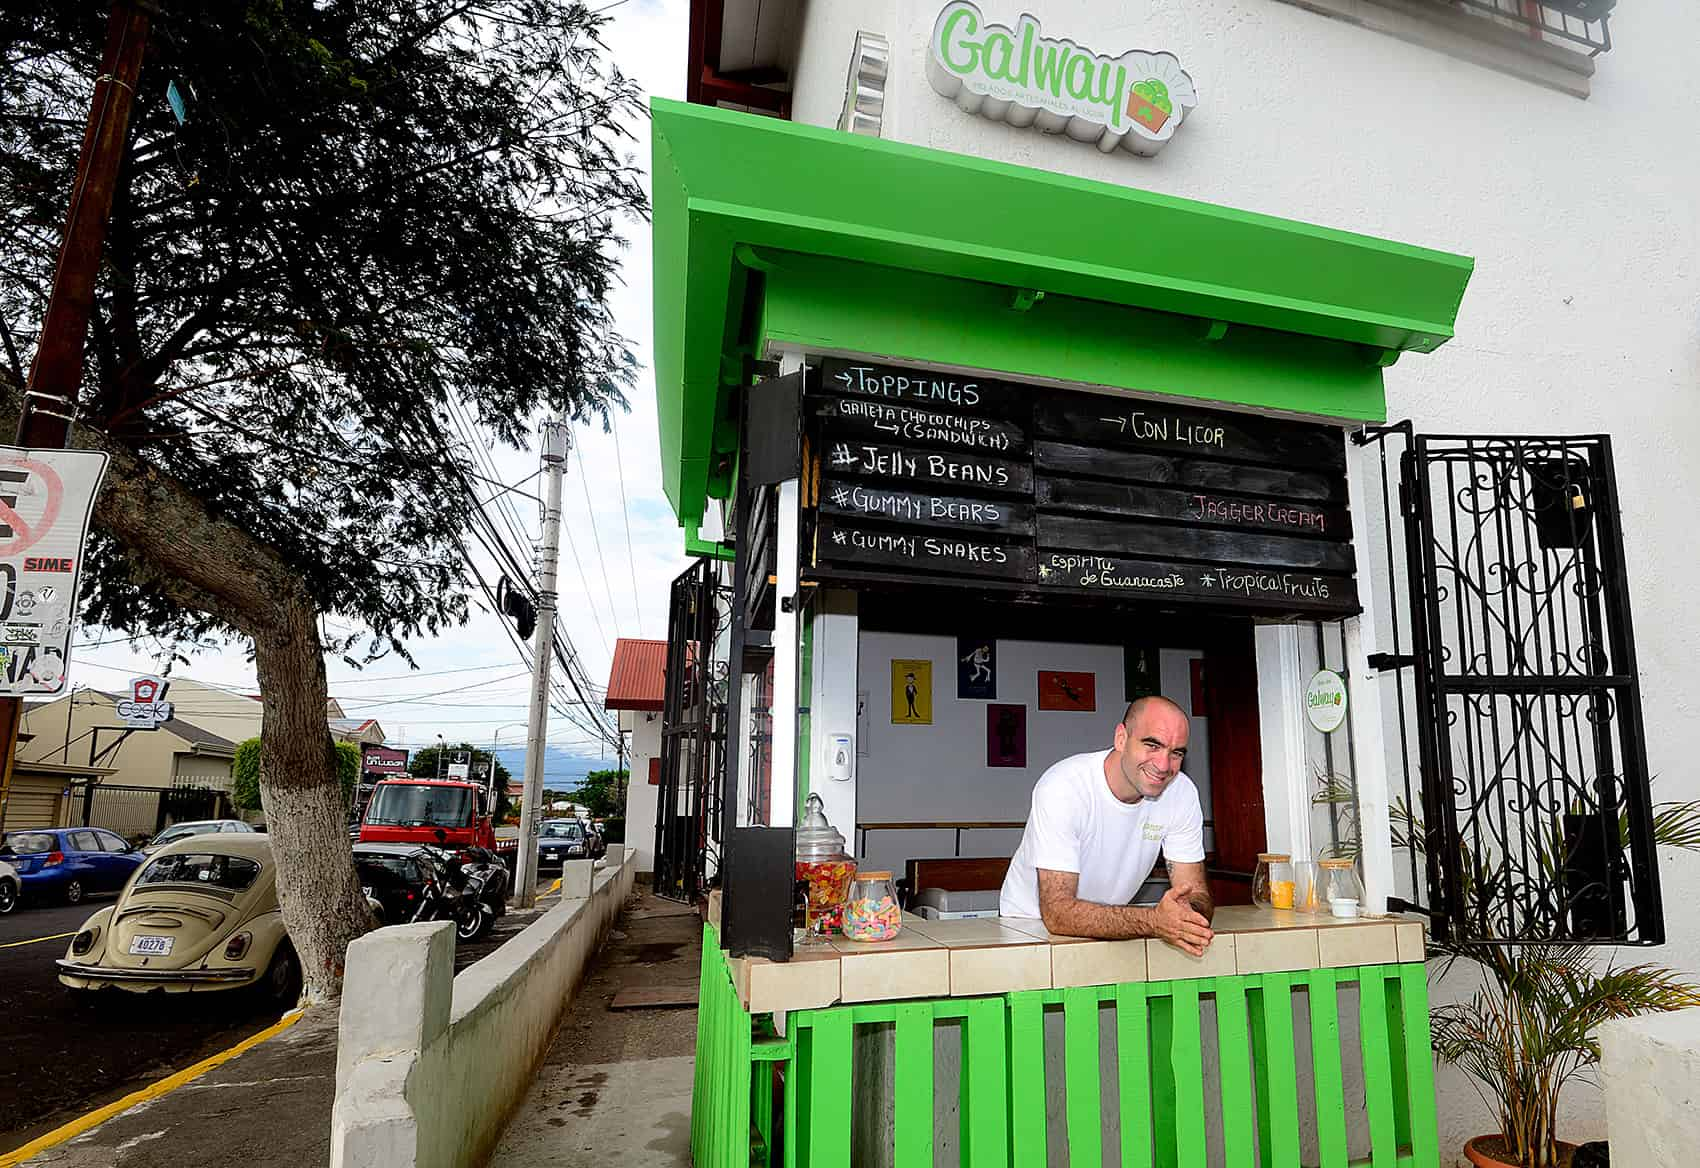 Costa Rica ice cream: Rodrigo Brenes at Galway